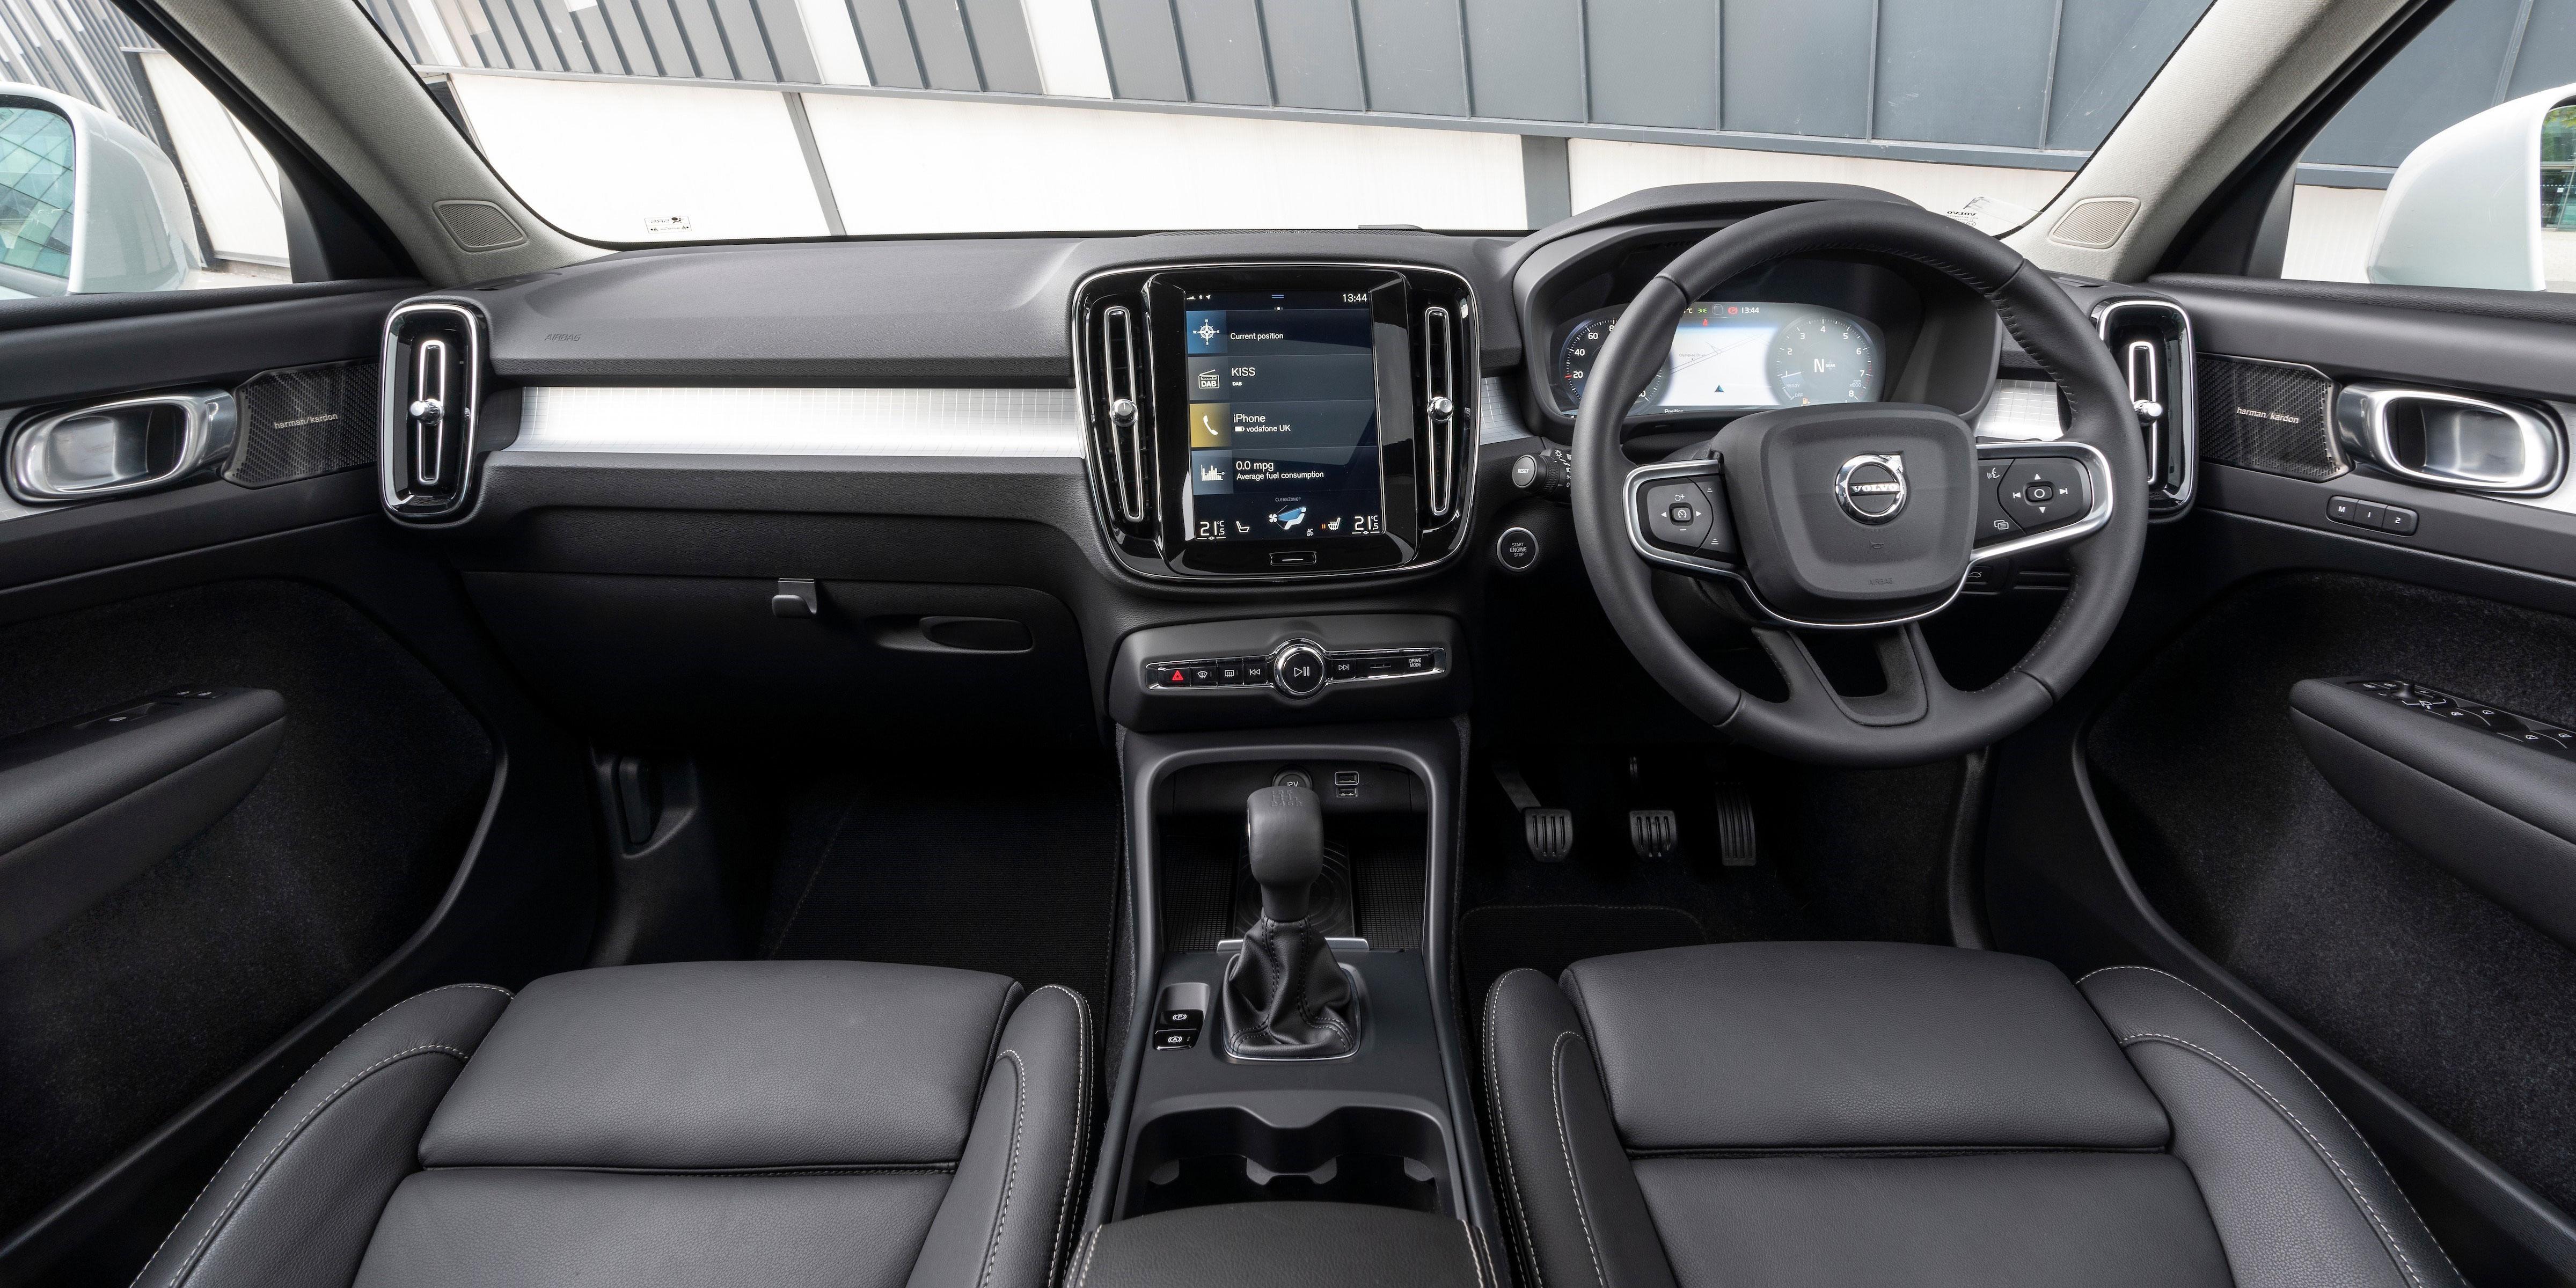 Volvo Xc40 Interior Infotainment Carwow